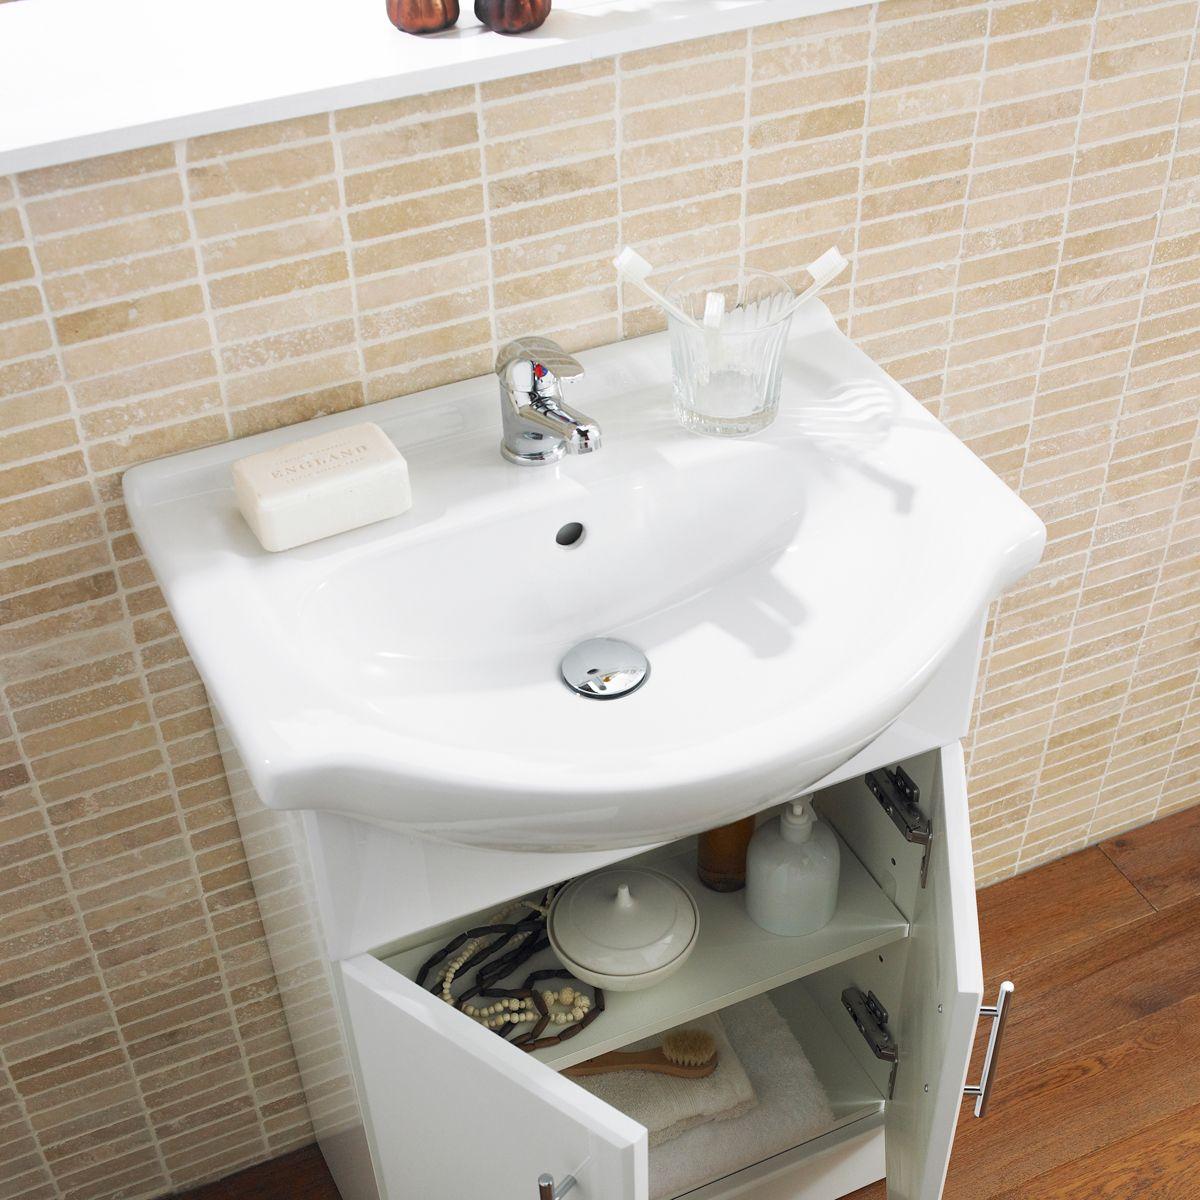 Premier Saturn Bathroom Furniture Pack Round Basin